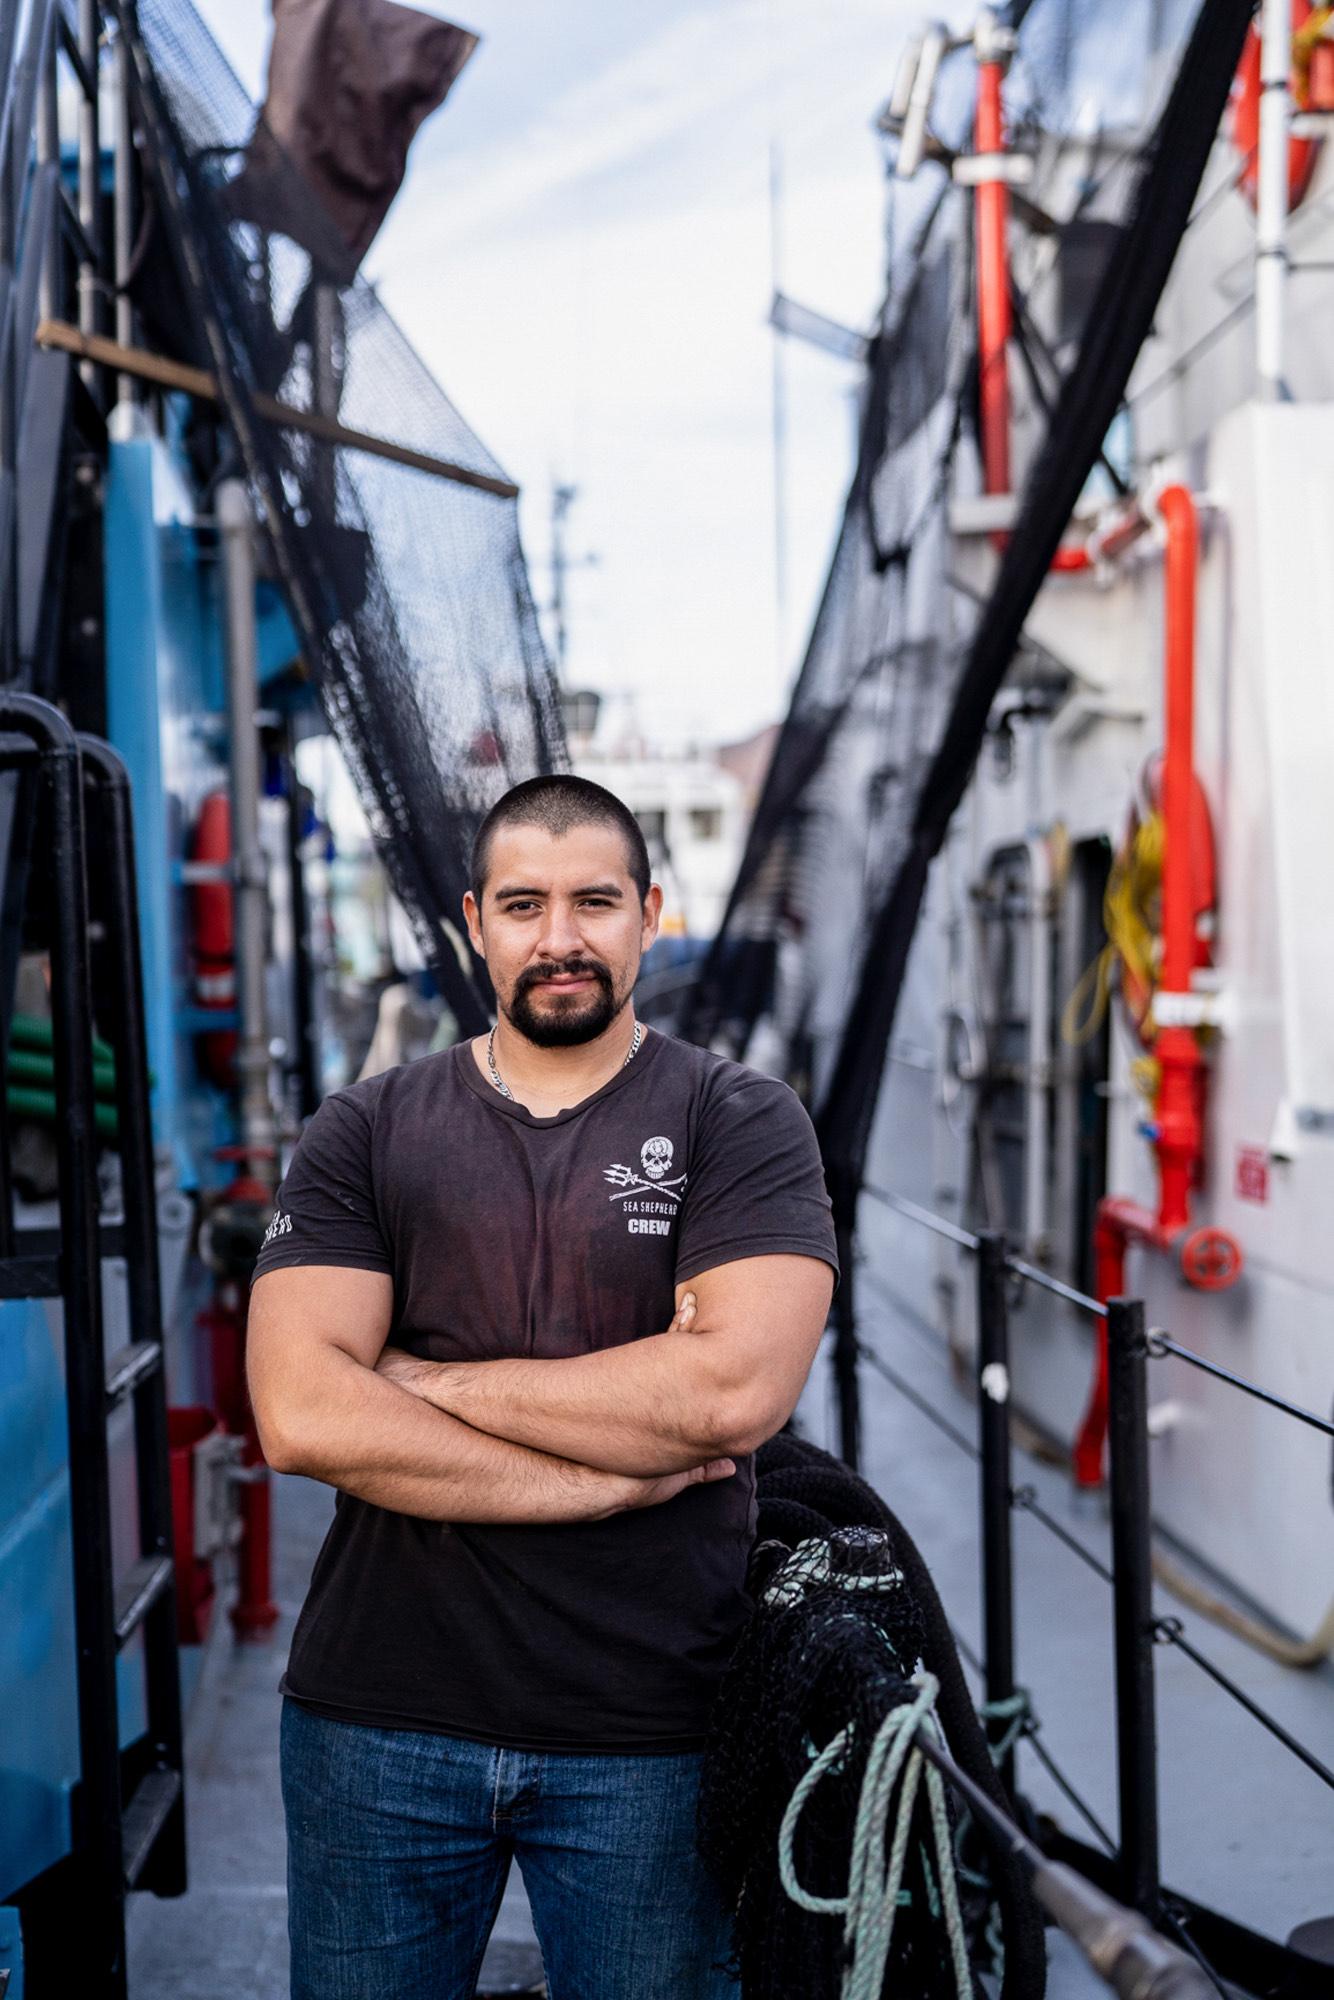 sea-shepherd-engineer-portrait SEA SHEPHERD